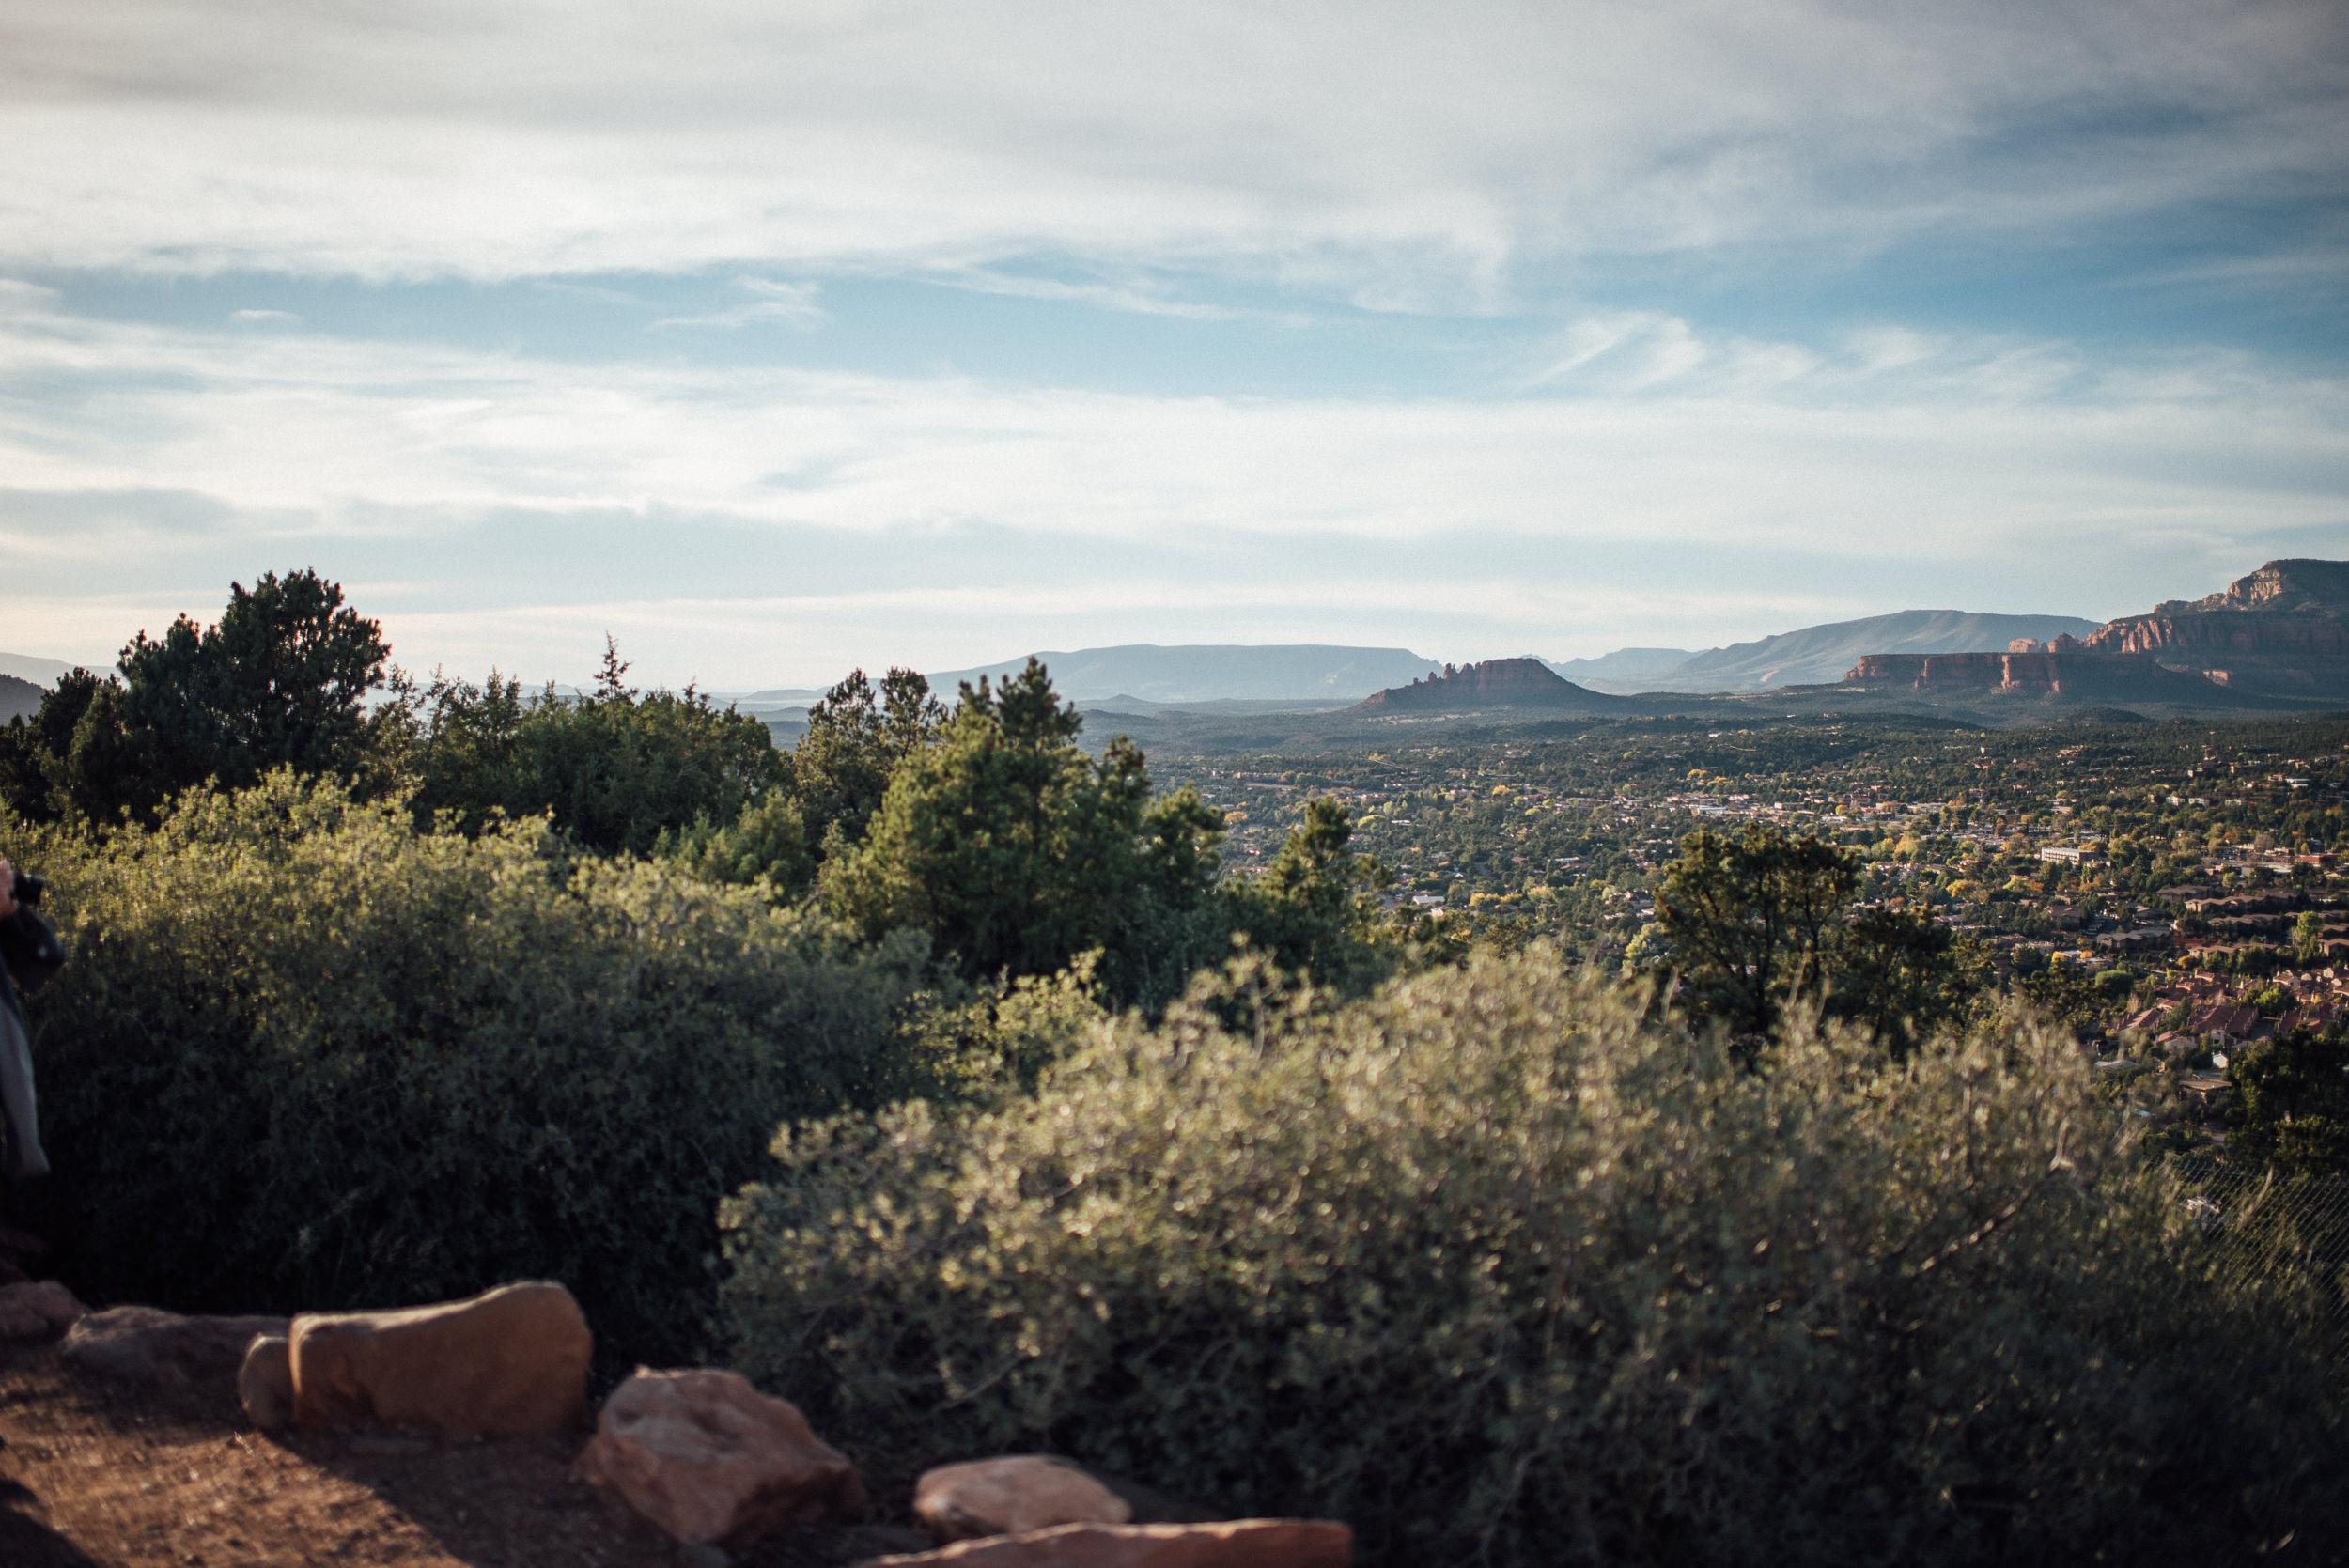 Arizona-Boho-Wedding-Photographer-Handbags-28.jpg